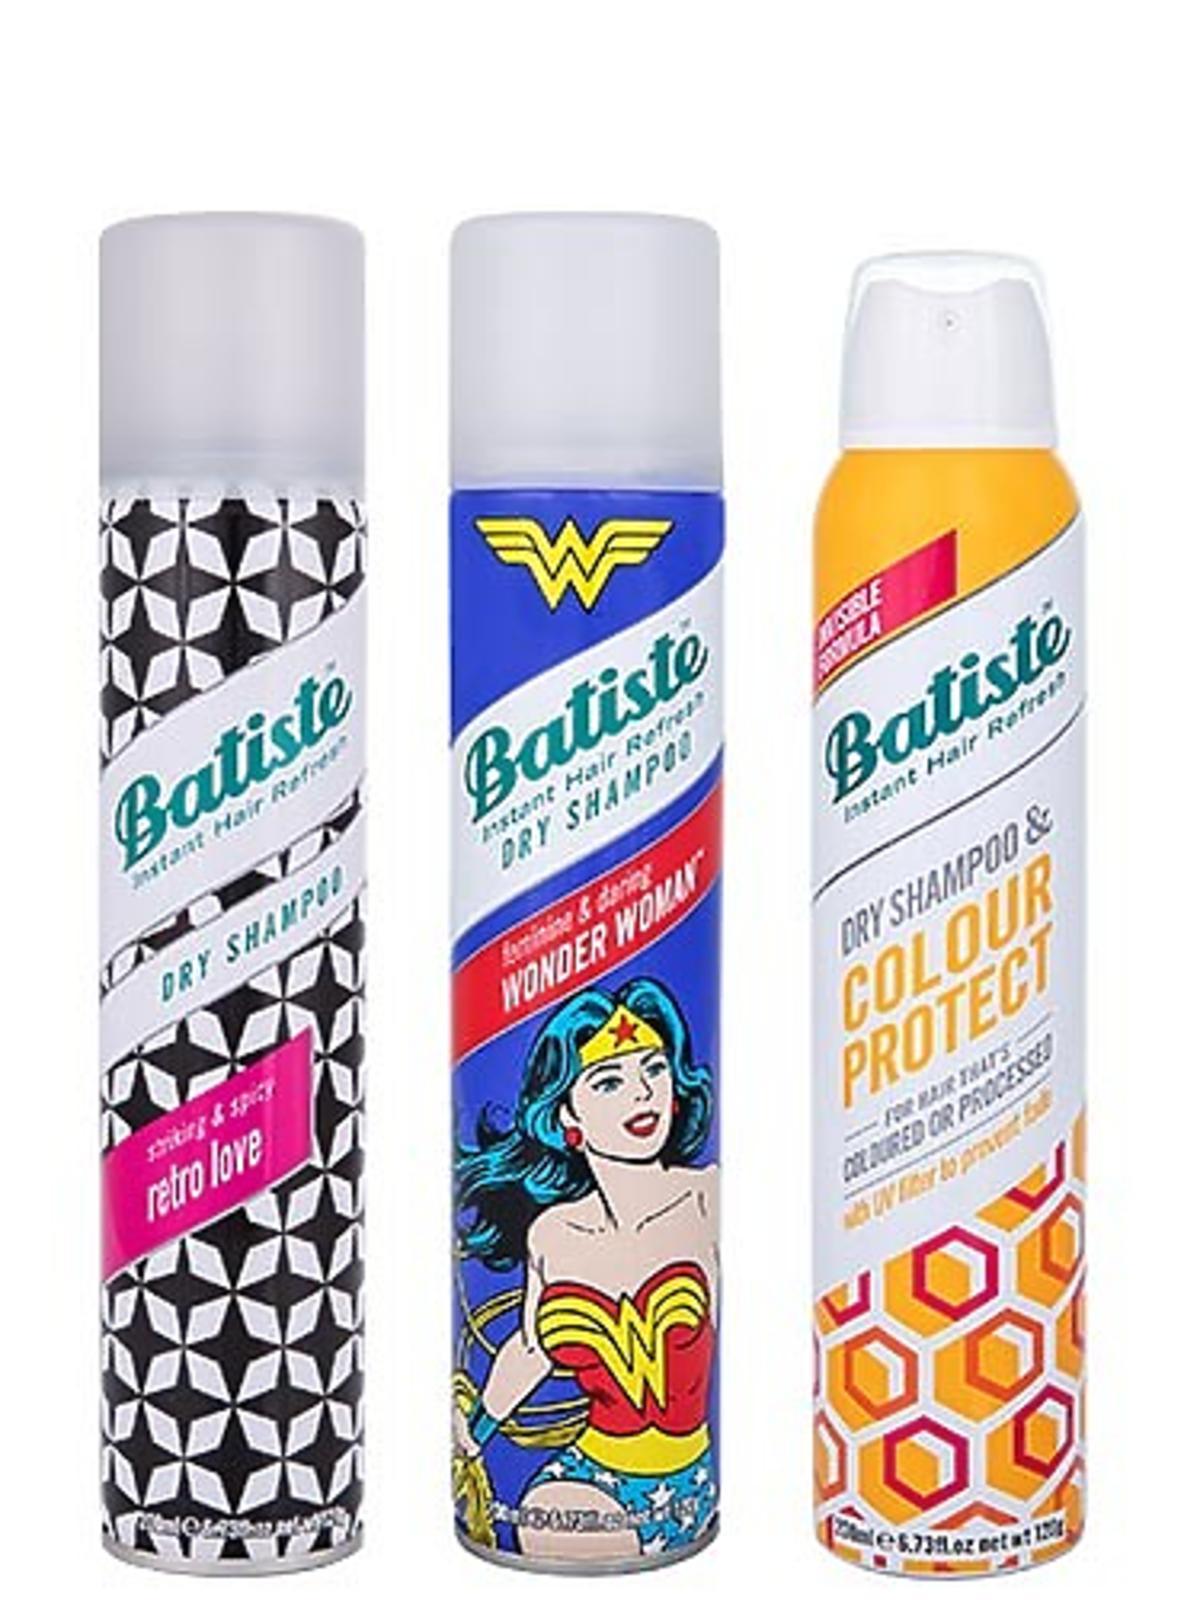 Kosmetyki Batiste